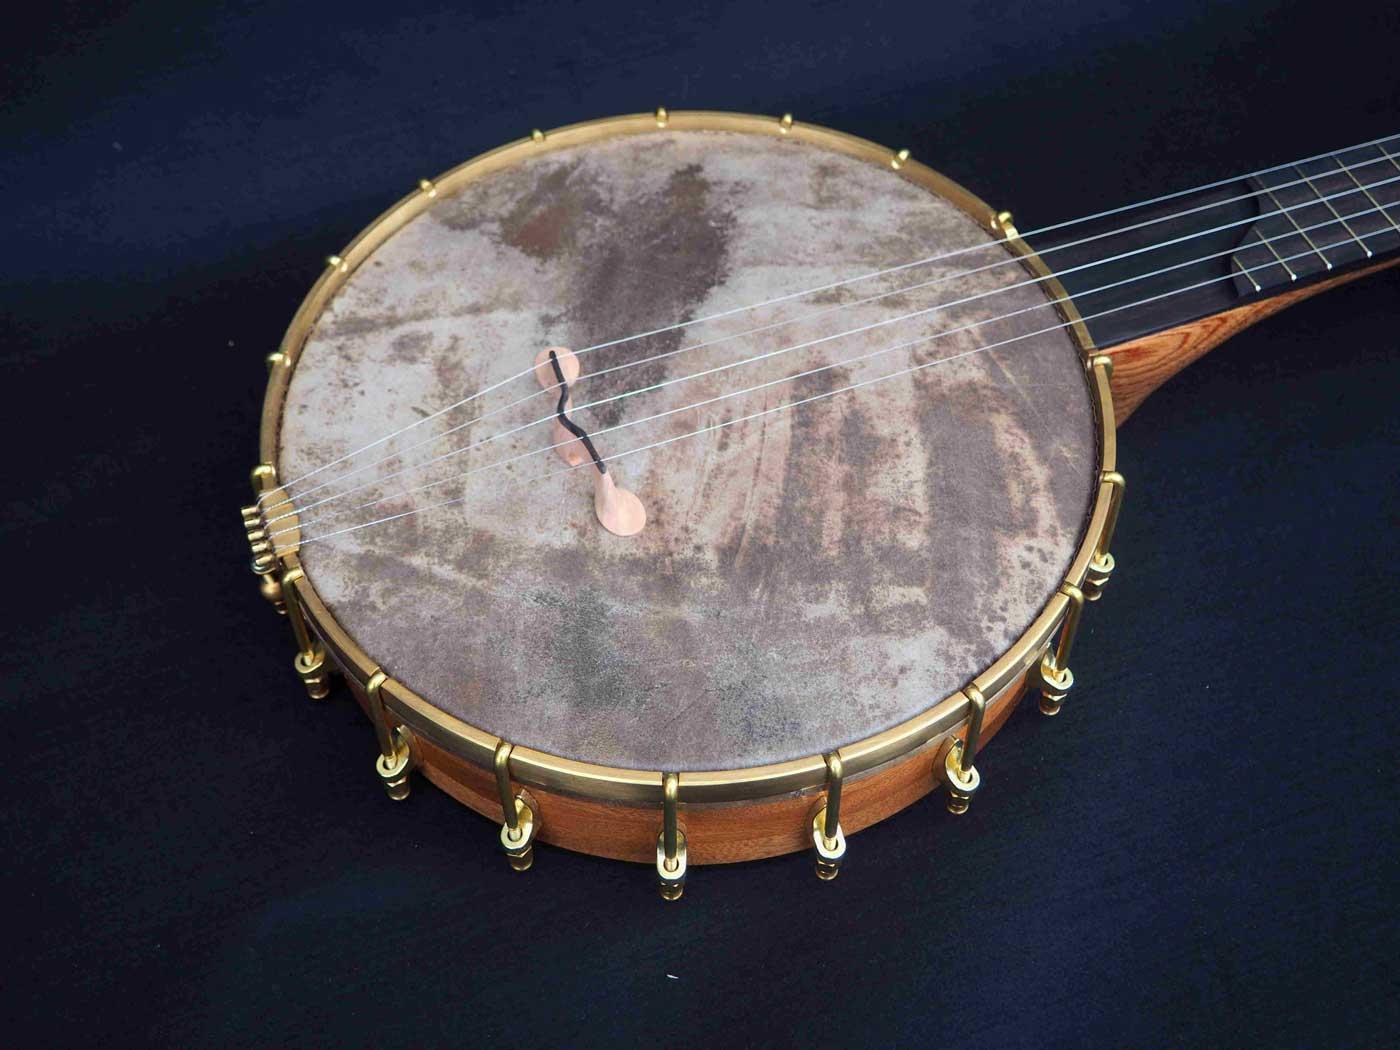 Copper plate semi fretless Banjo vellum